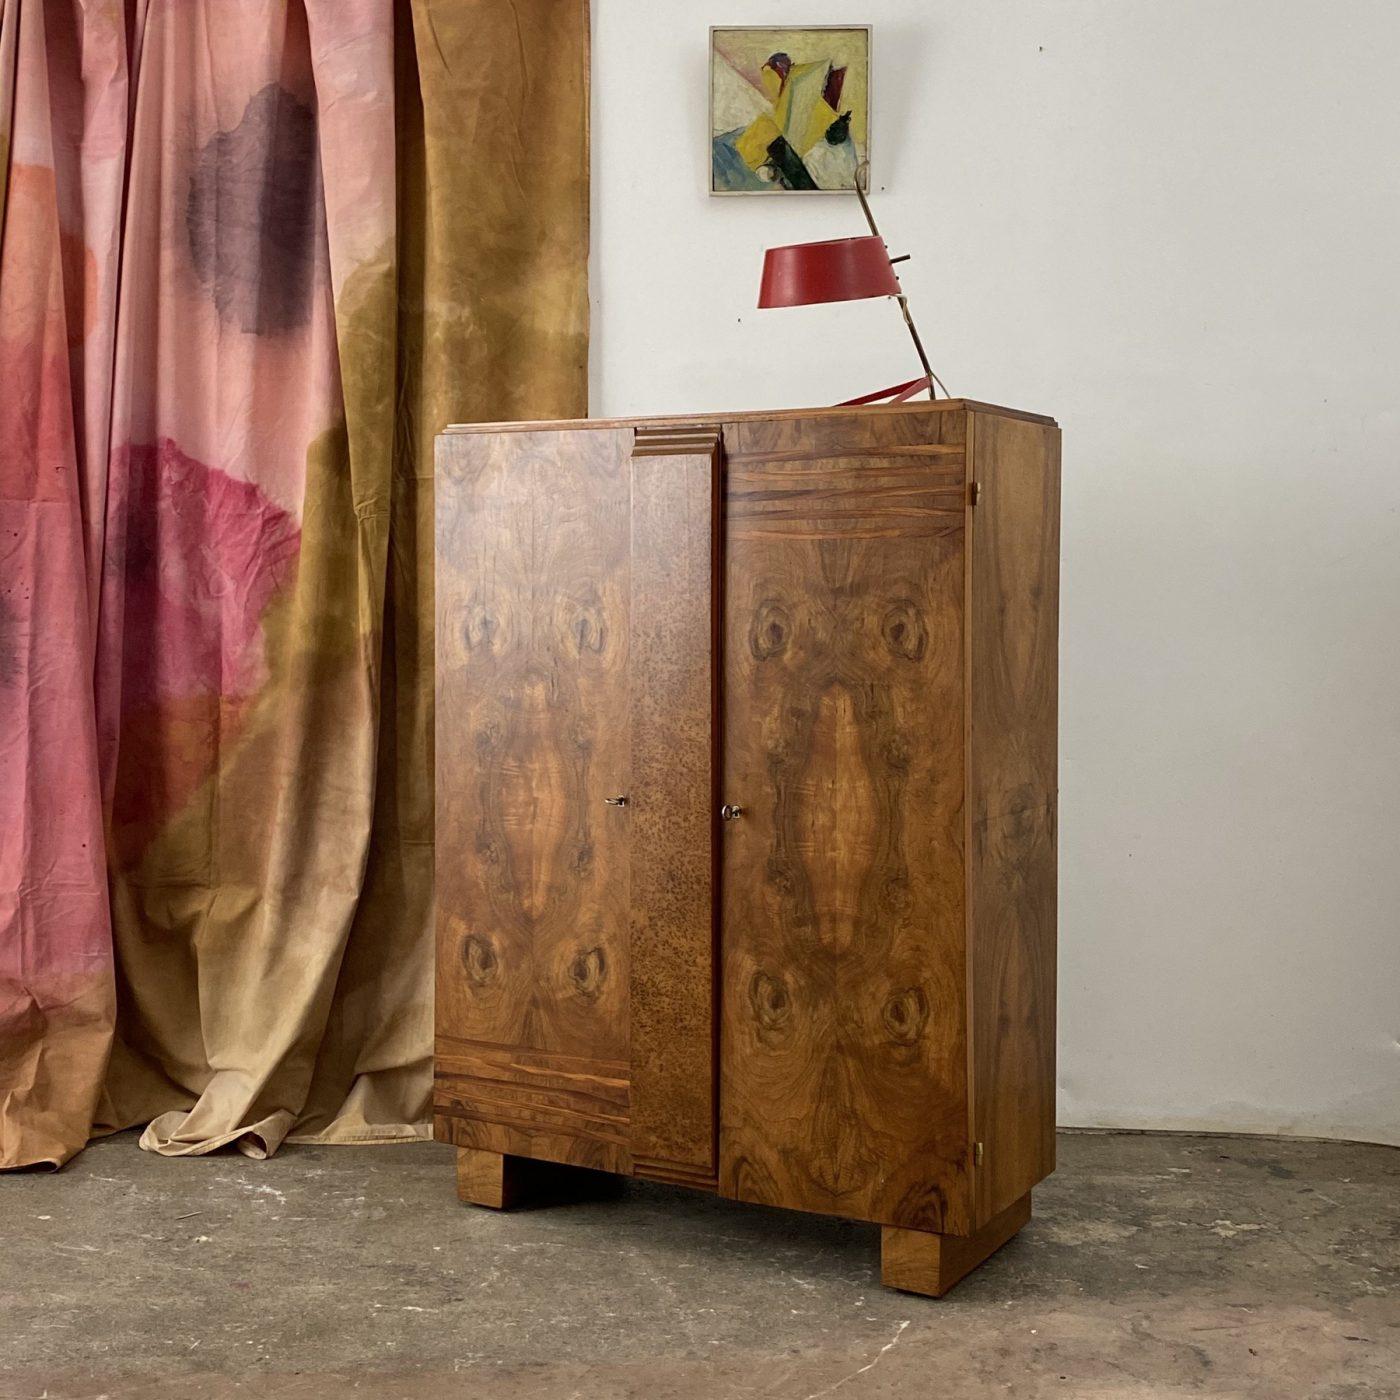 objet-vagabond-artdeco-cabinet0000